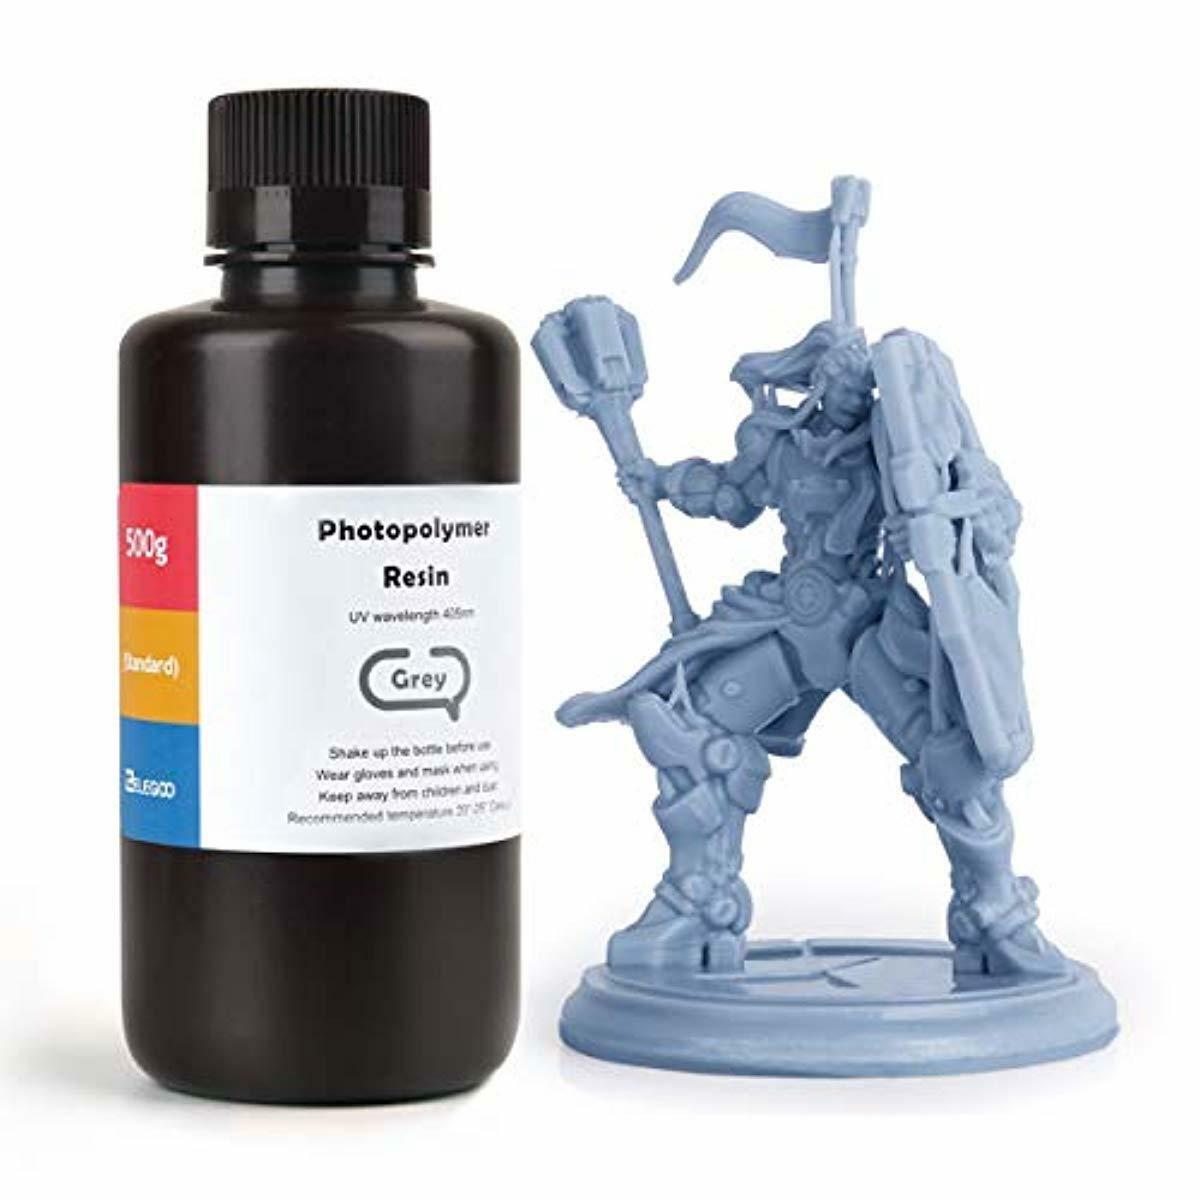 ELEGOO ABS-Like 3D Printer Rapid Resin LCD UV-Curing Resin